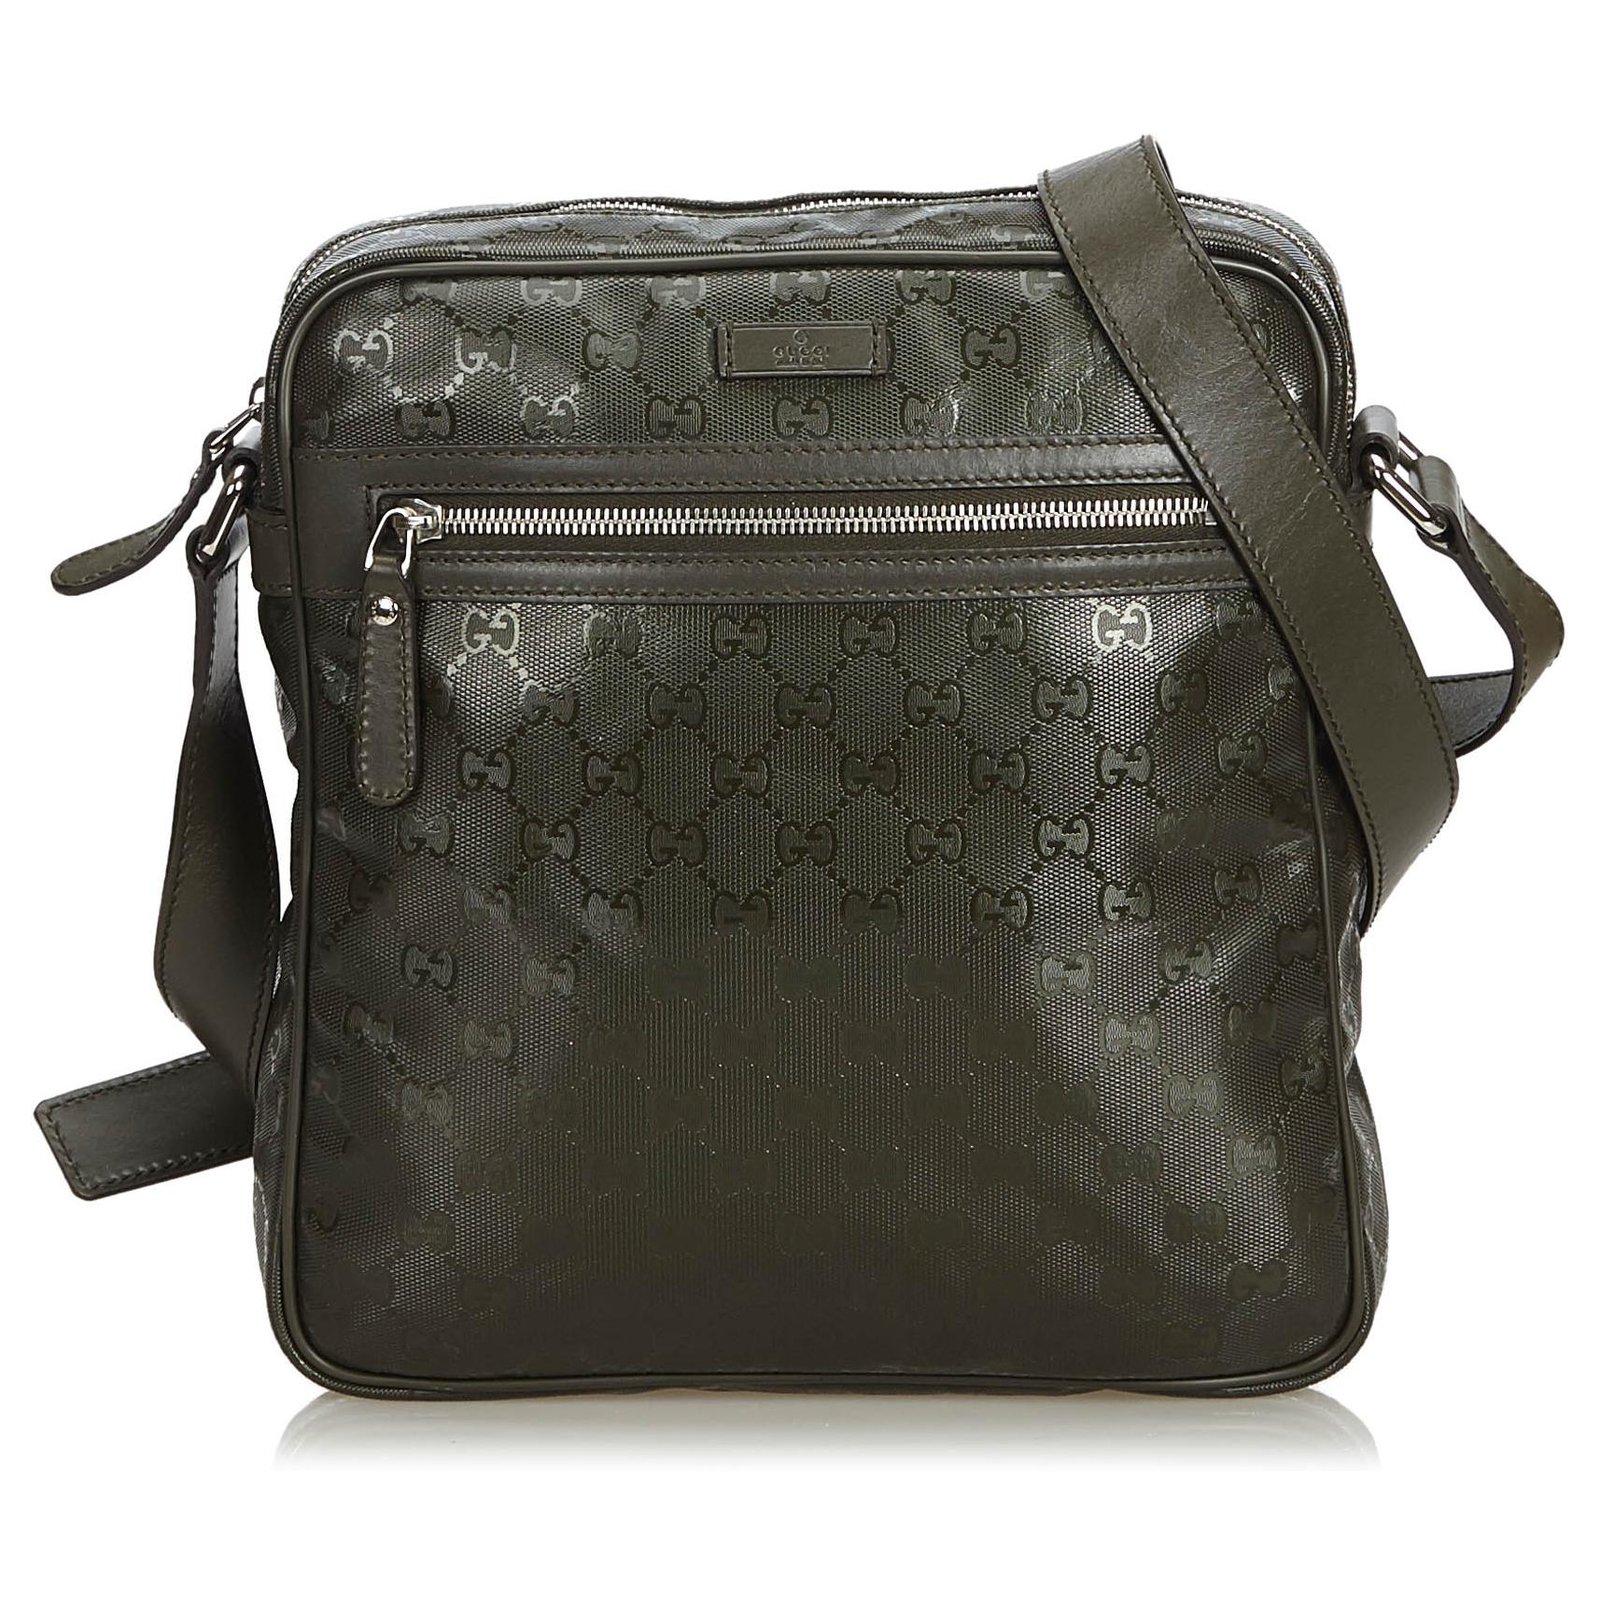 94f17fa16d06 Gucci Gucci Black GG Imprime Crossbody Bag Handbags Leather,Other,Plastic  Black ref.